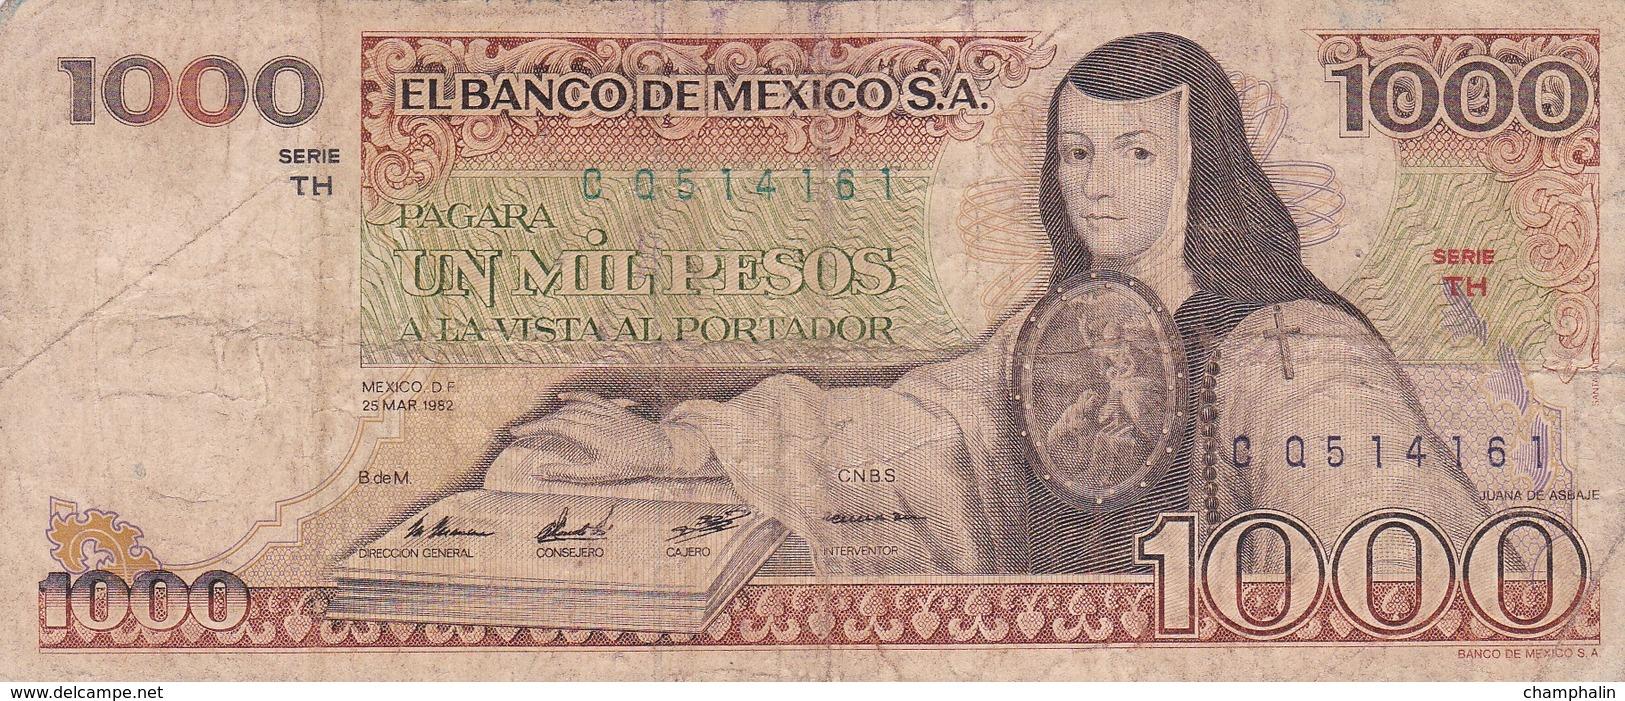 Mexique - Billet De 1000 Pesos - 25 Mars 1982 - Juana De Asbaje - Mexico